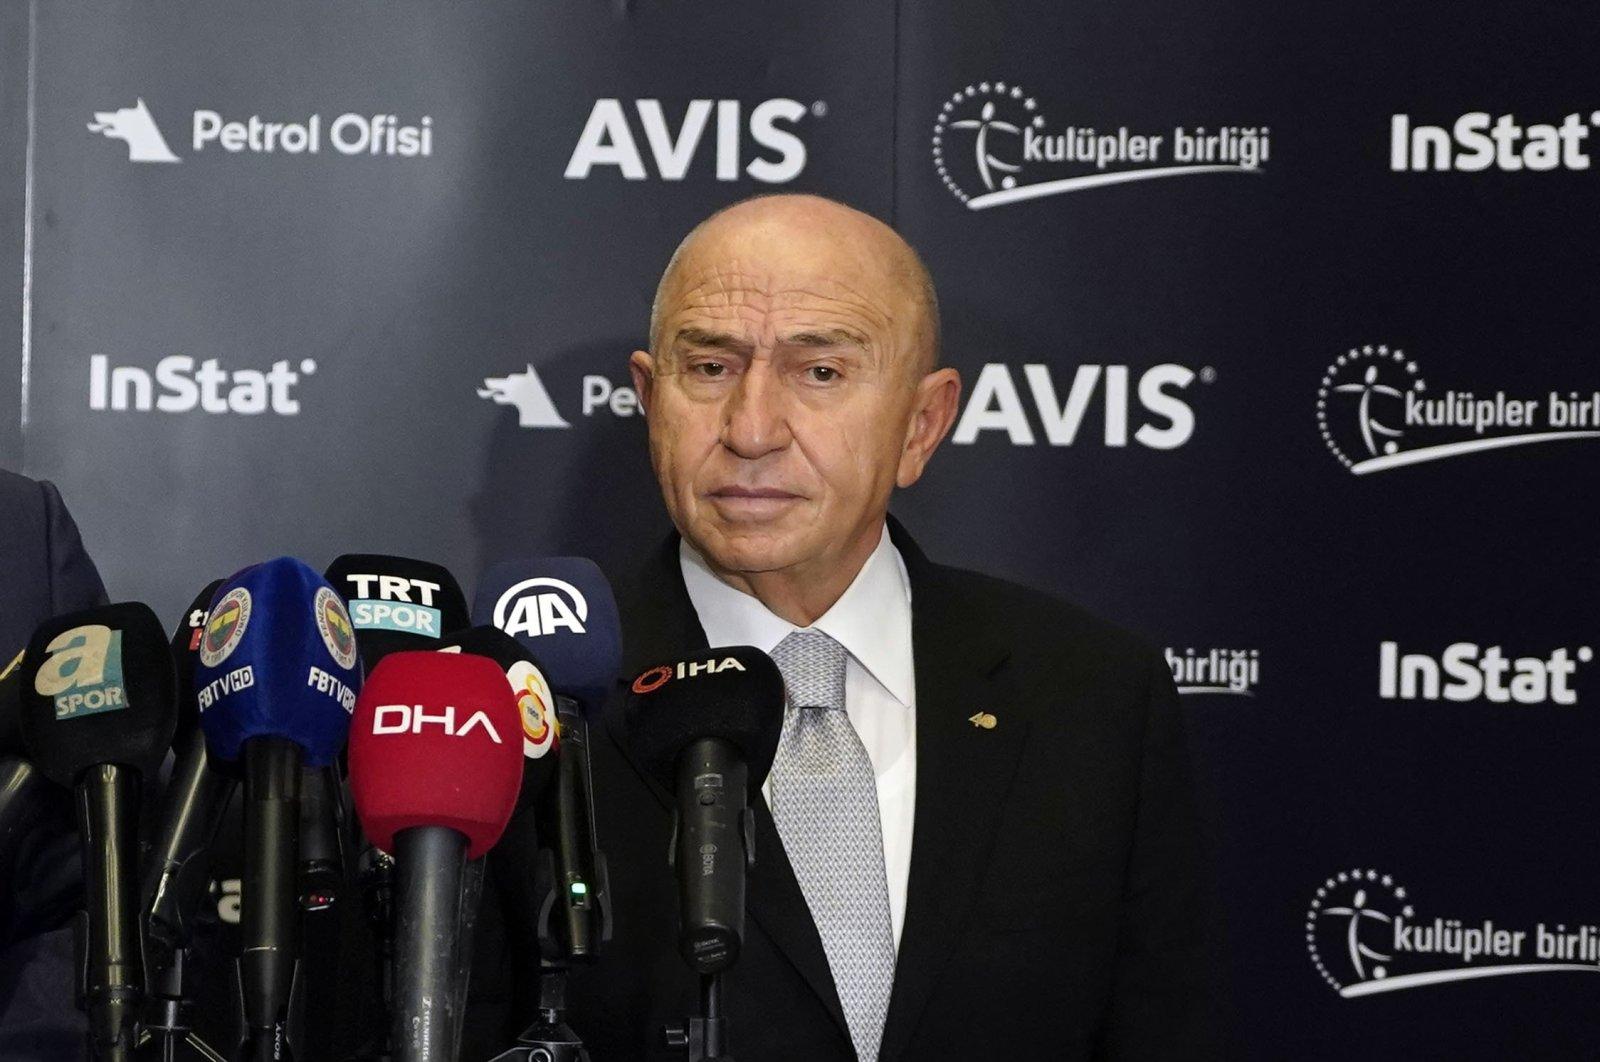 Nihat Özdemir speaks at a press conference in Istanbul, Turkey, Nov. 11, 2020. (İHA PHOTO)